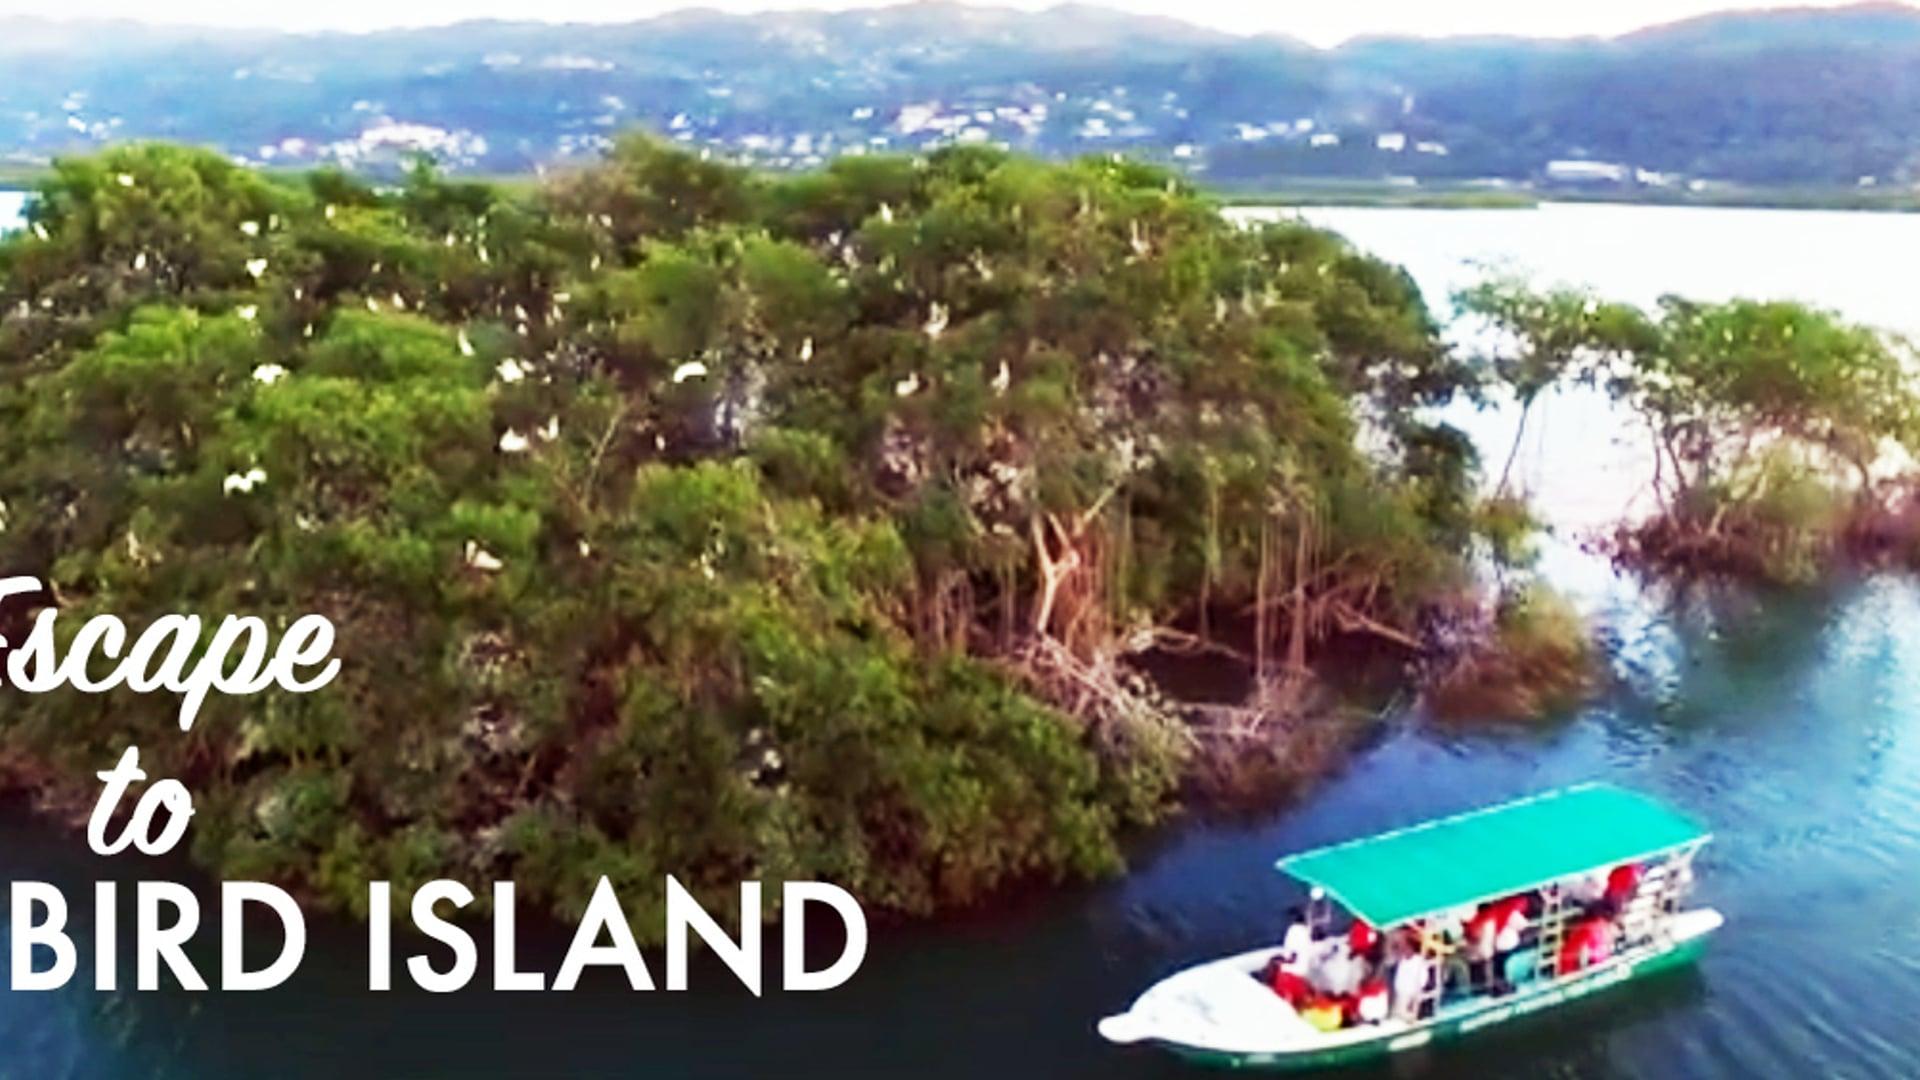 Escape to Bird Island